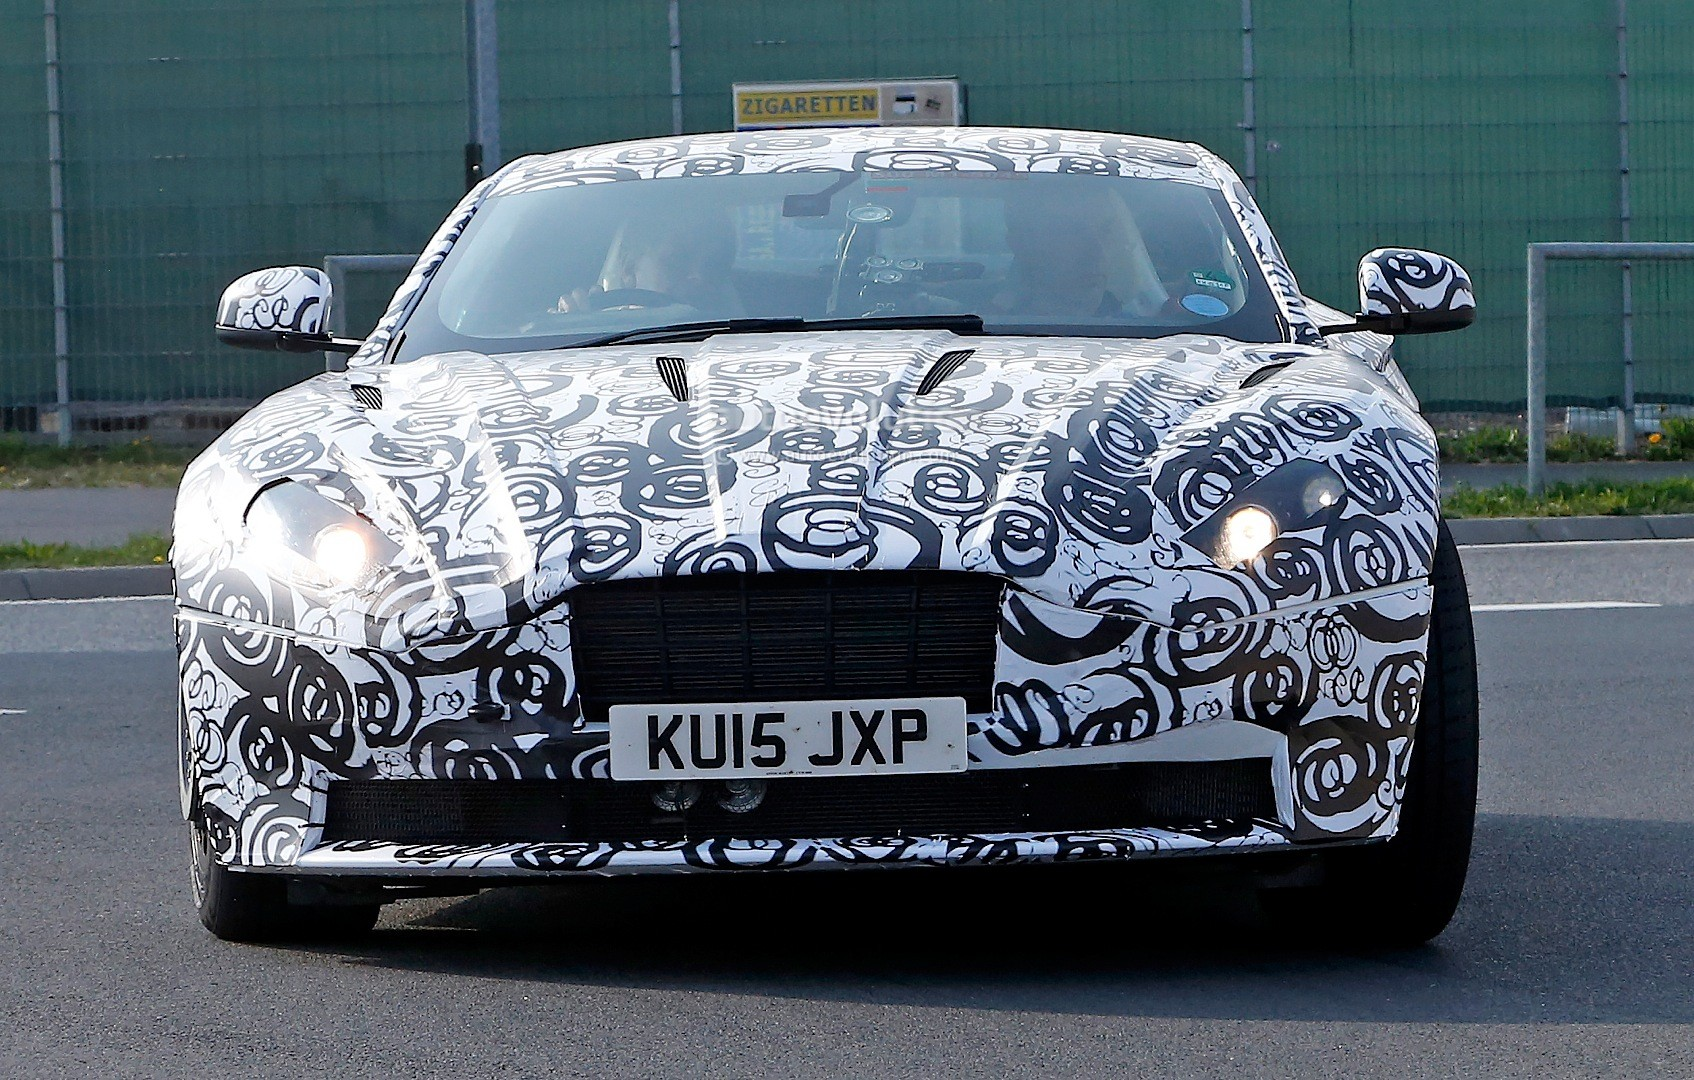 2016 - [Aston Martin] DB11 Spyshots-aston-martin-db11-prototype-seen-testing-at-the-nurburgring_10